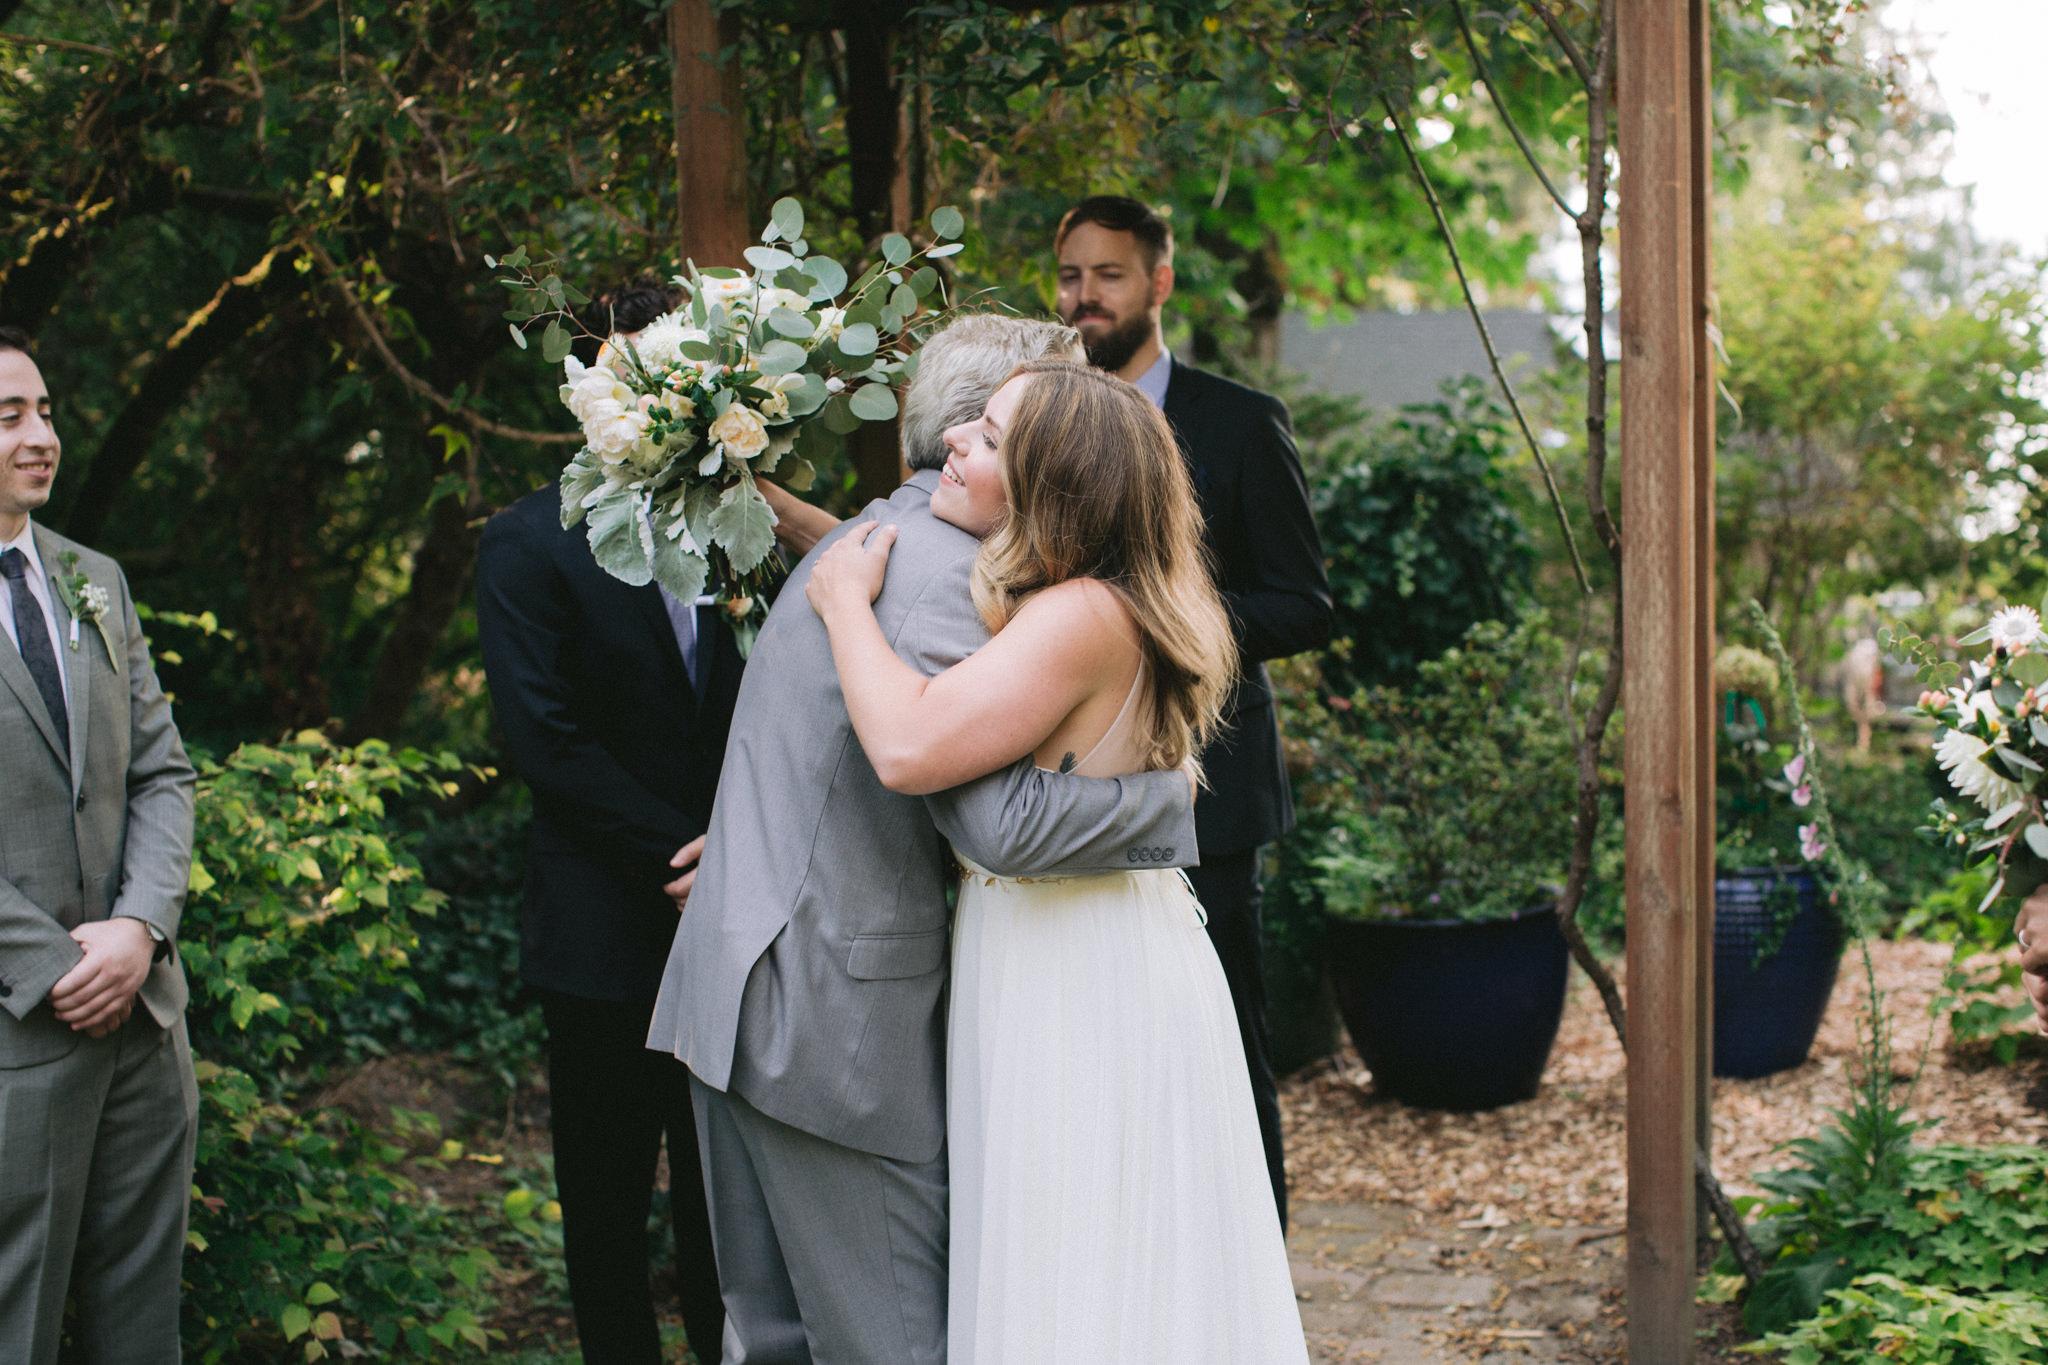 Backyard-Bainbridge-Island-Wedding-Alycia-Lovell-Photography-90.JPG